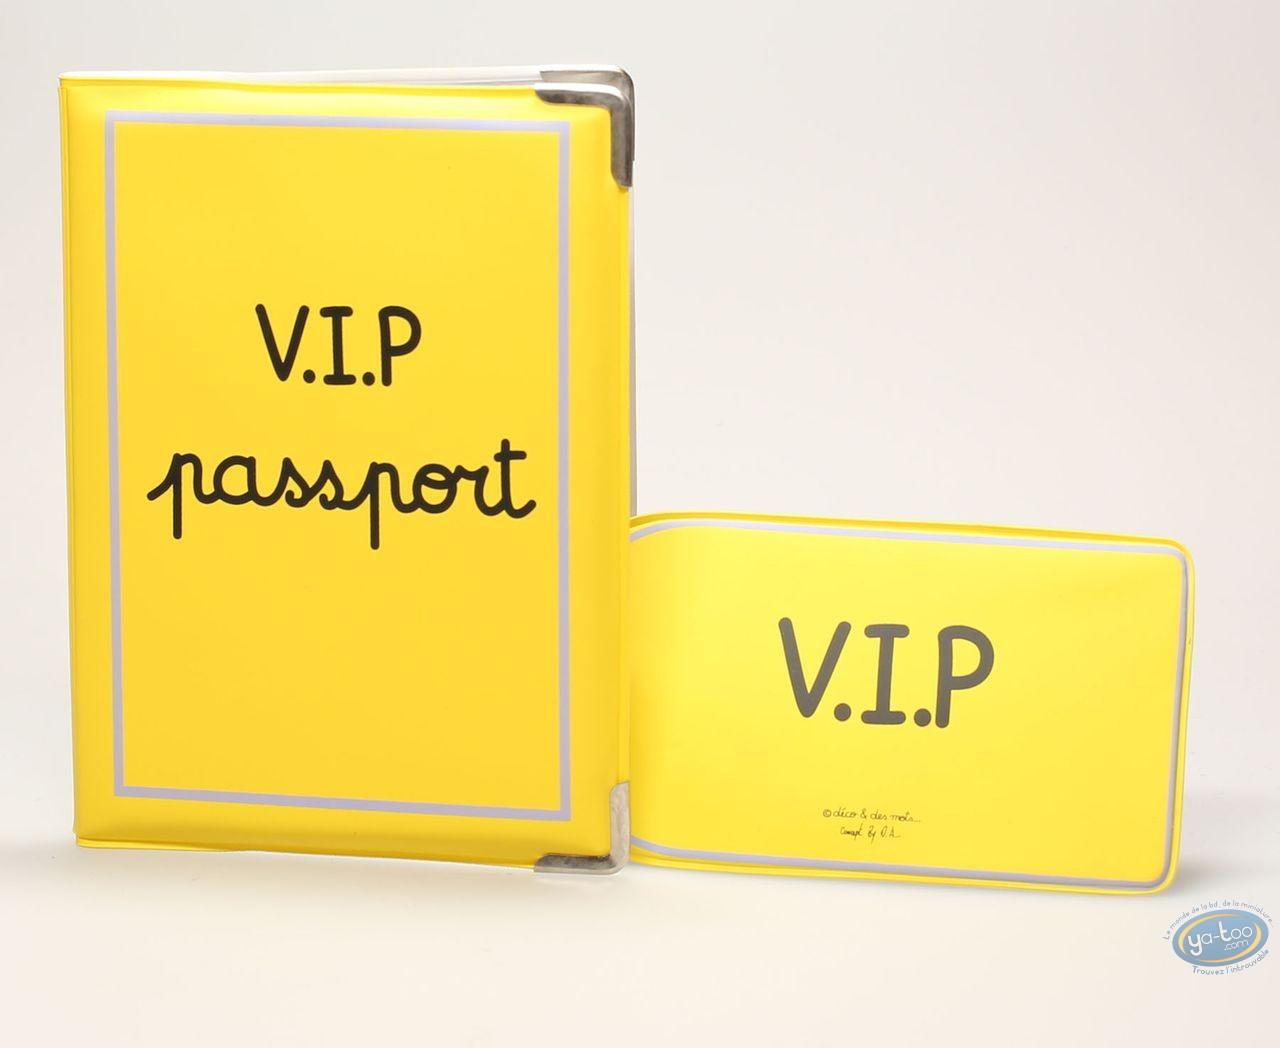 Luggage, Passport protection + luggage label holder : VIP